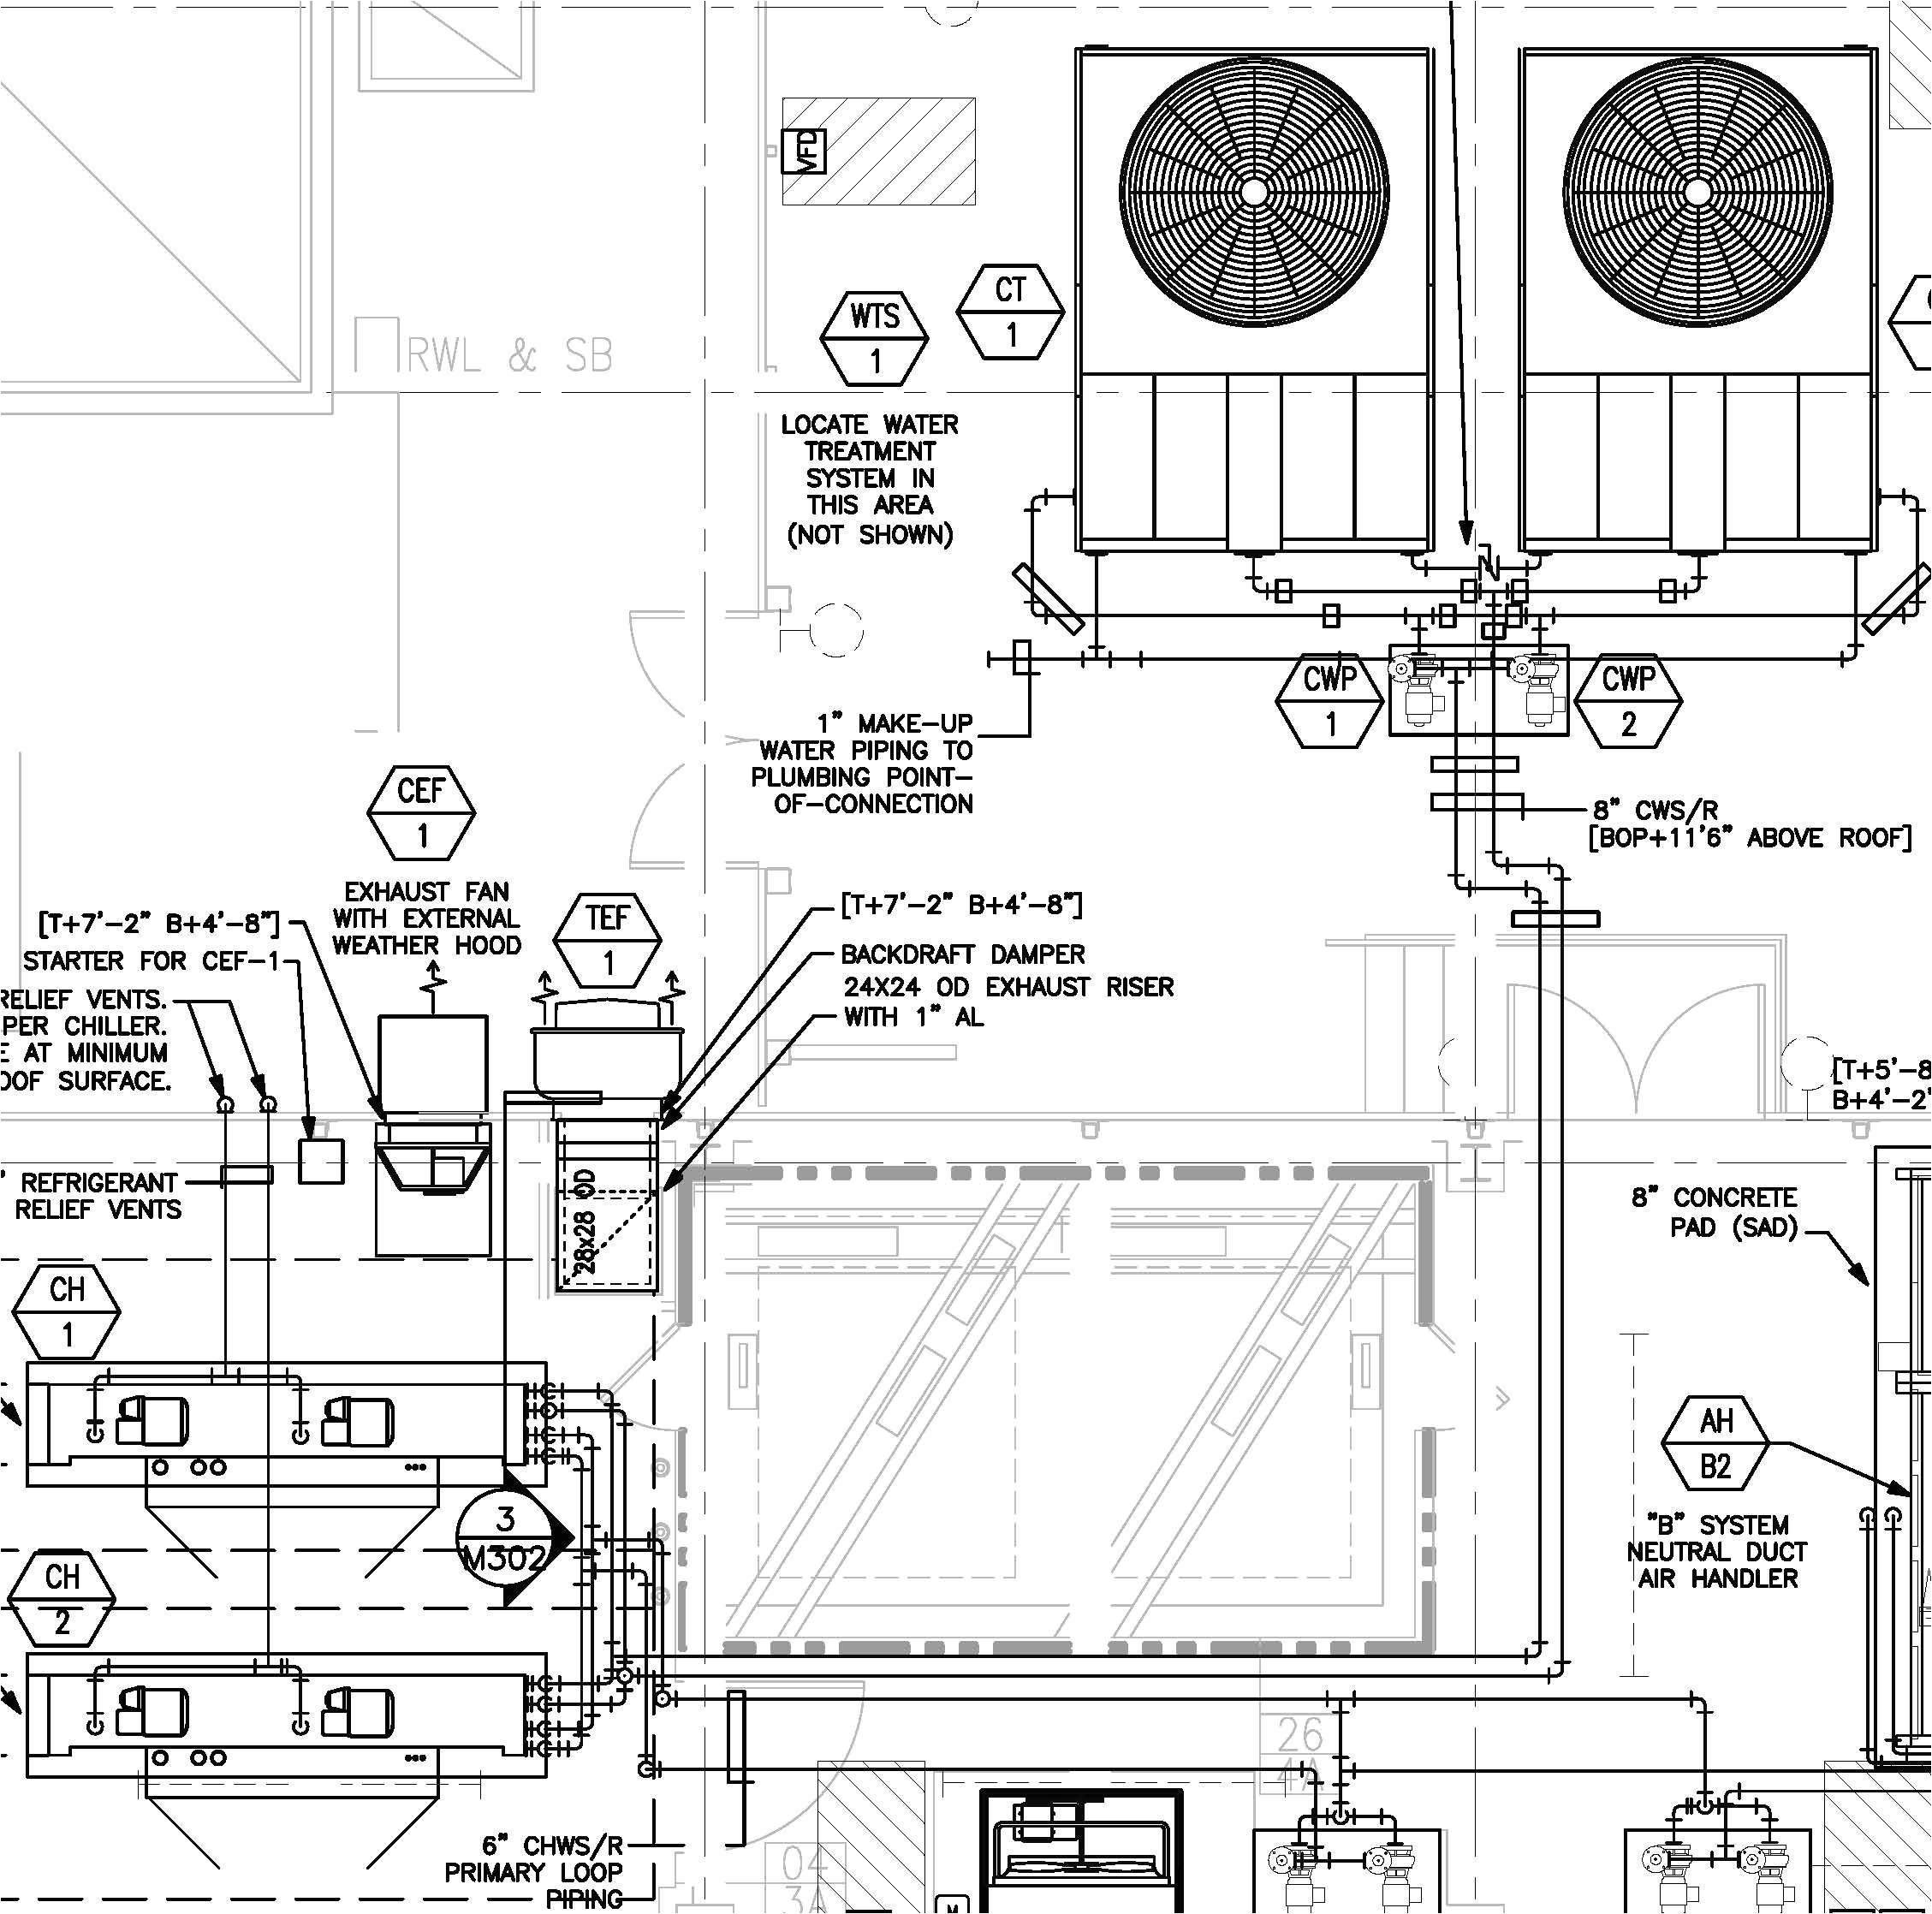 condenser wiring diagram wiring diagram york ac condenser wiring diagram ac condenser wiring diagram